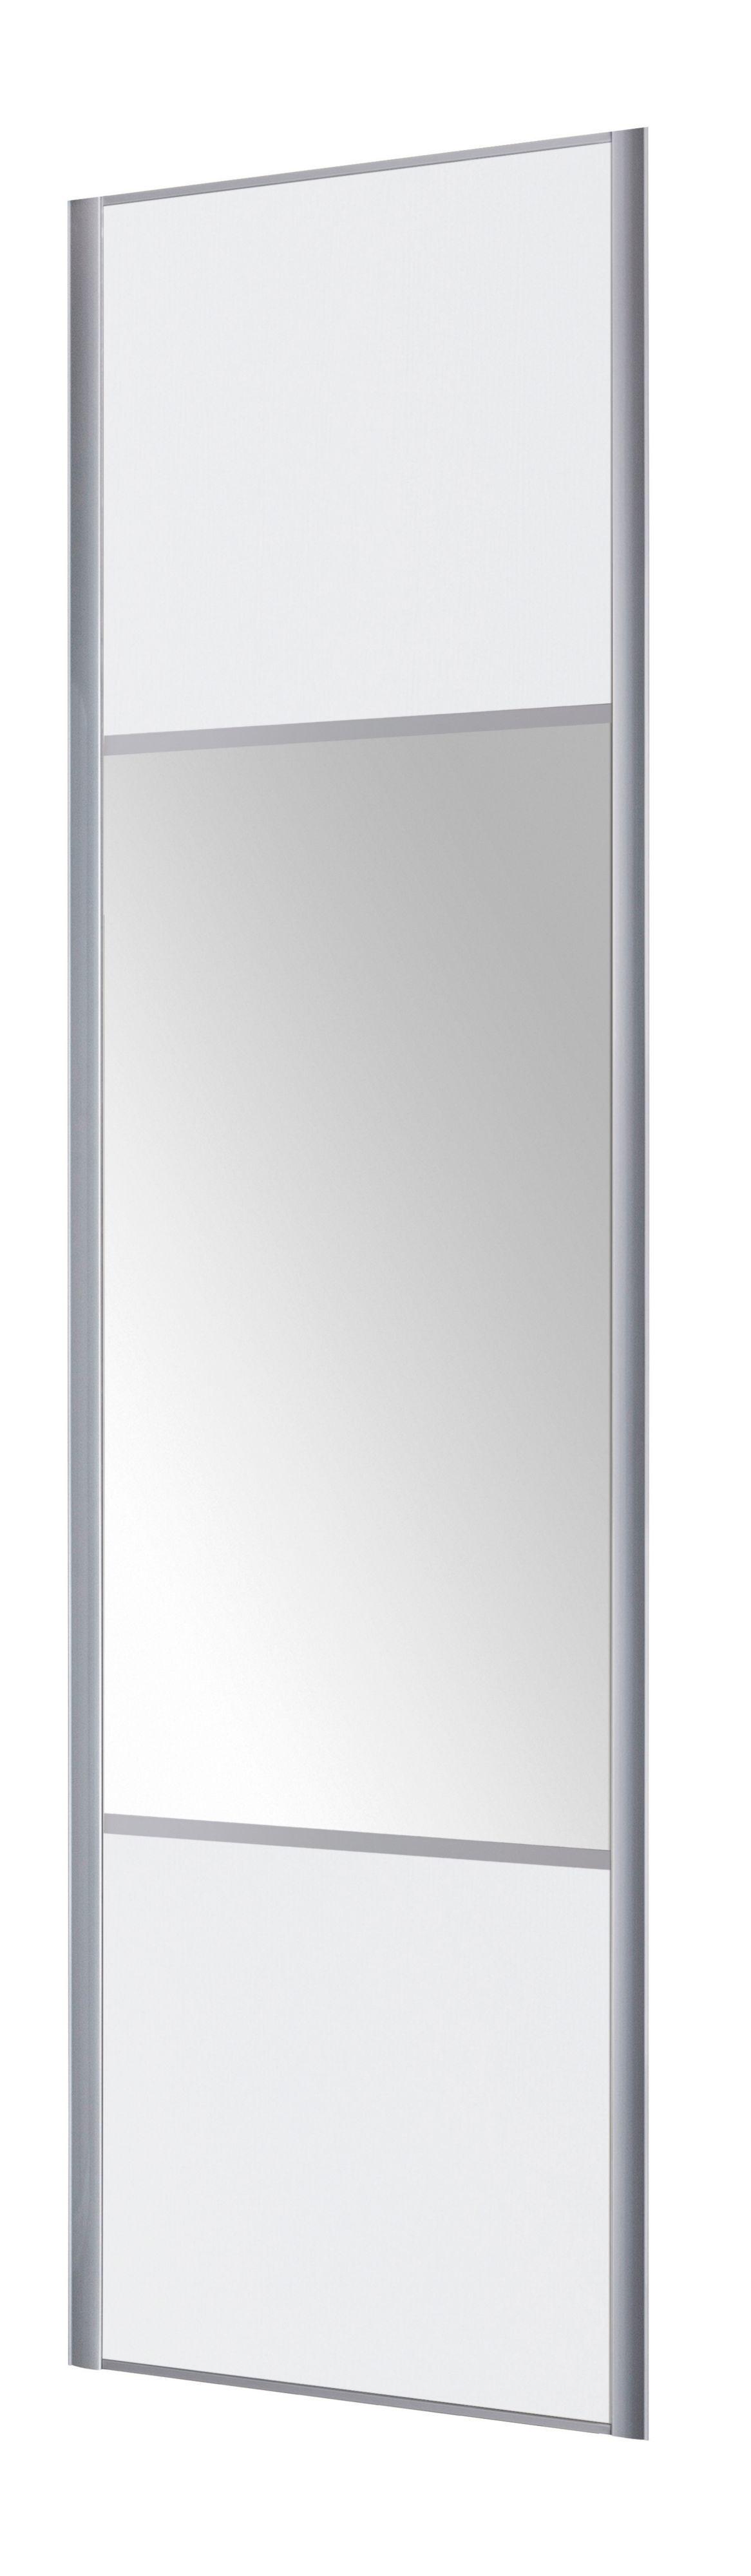 B q sliding mirrored wardrobe doors 28 images b q b q for B q bedrooms sliding wardrobe doors